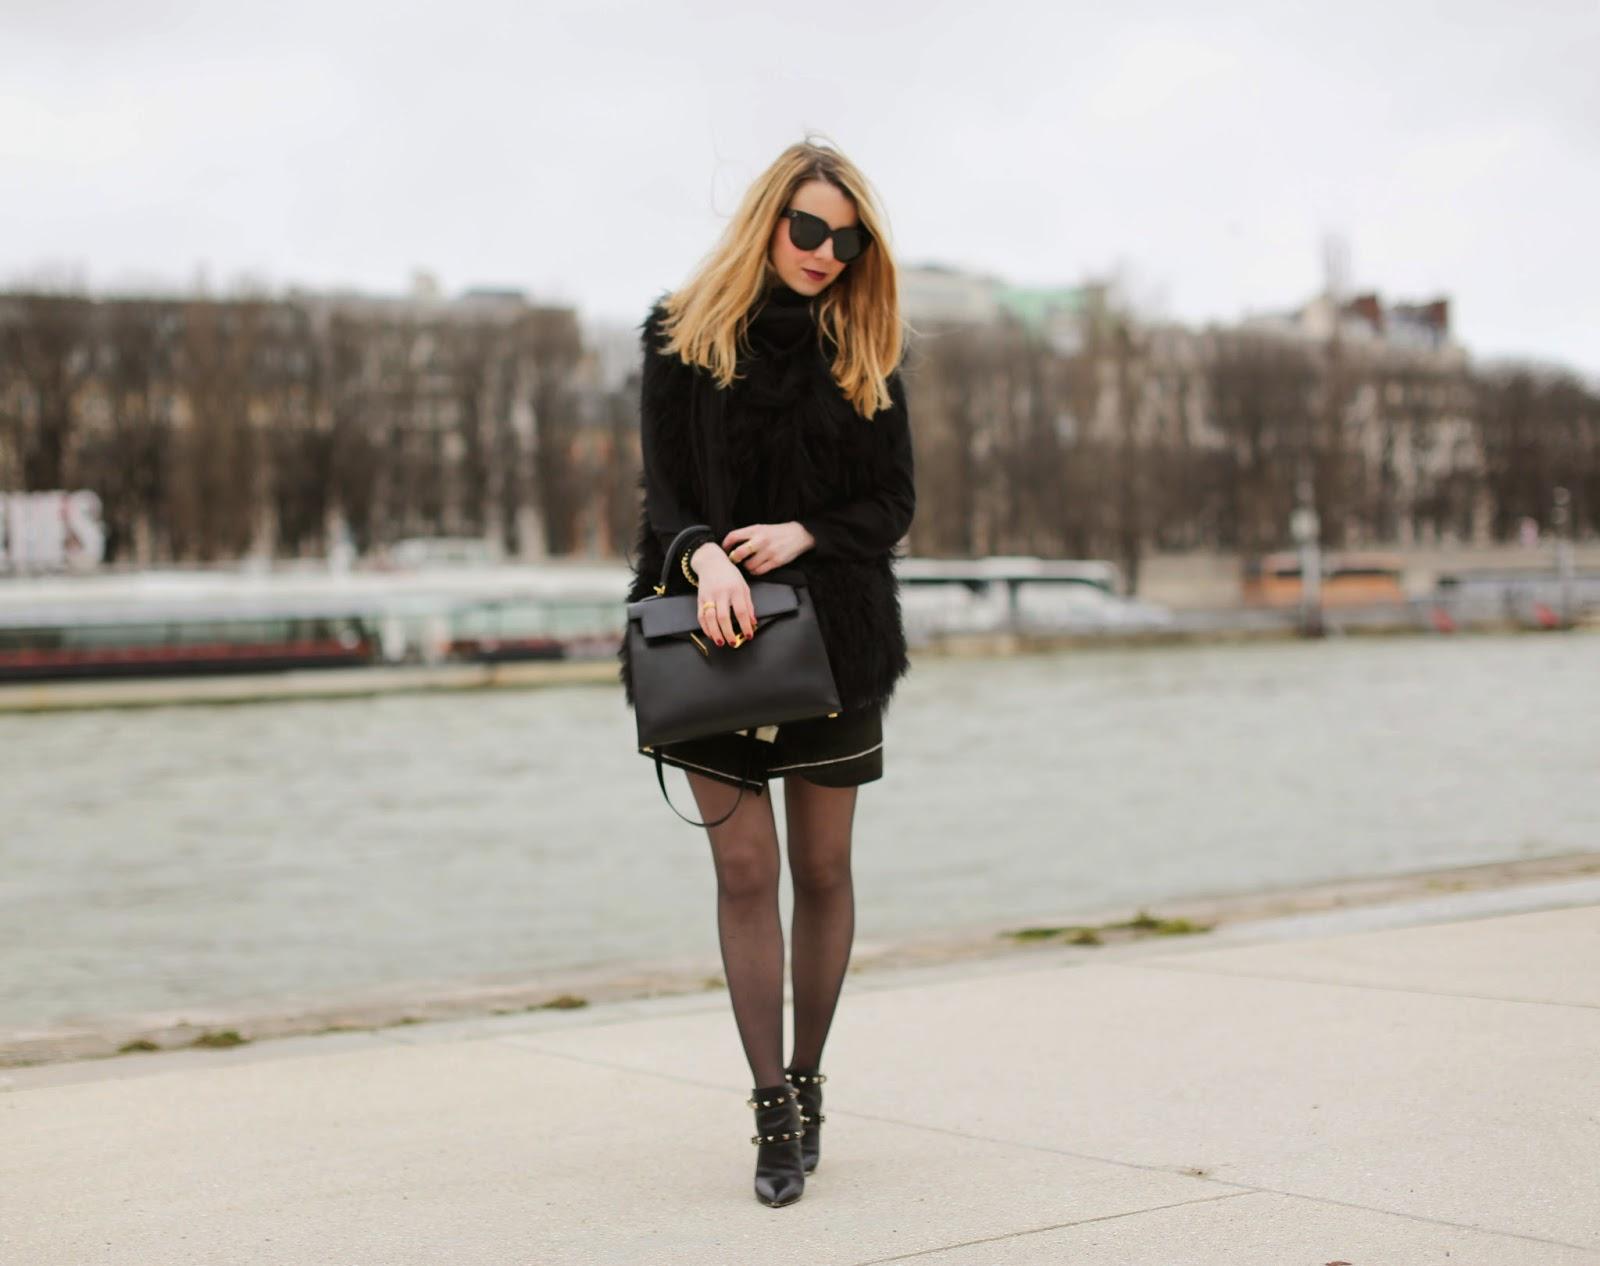 isabel marant, fur, zadig et voltaire, valentino, kelly, hermès, paris, streetstyle, fashion blogger